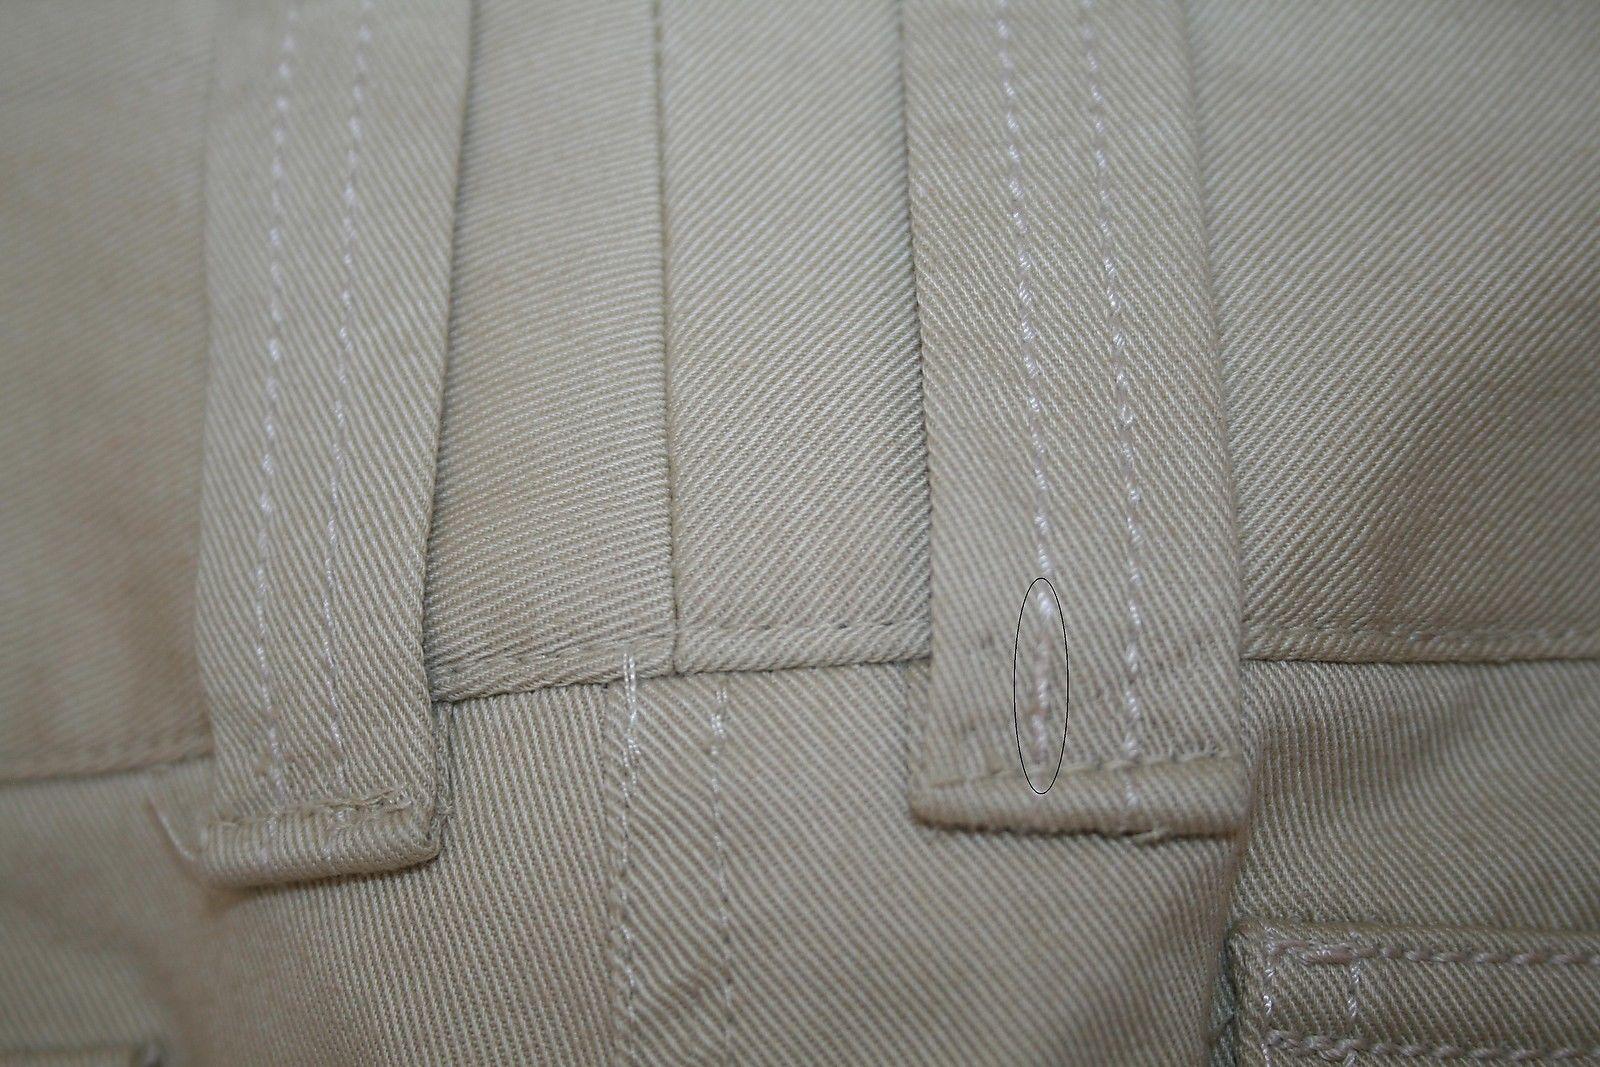 DOLCE & GABBANA Beige Cotton Crystal Logo Pocket Hardware Pants Size 42 US 6/8